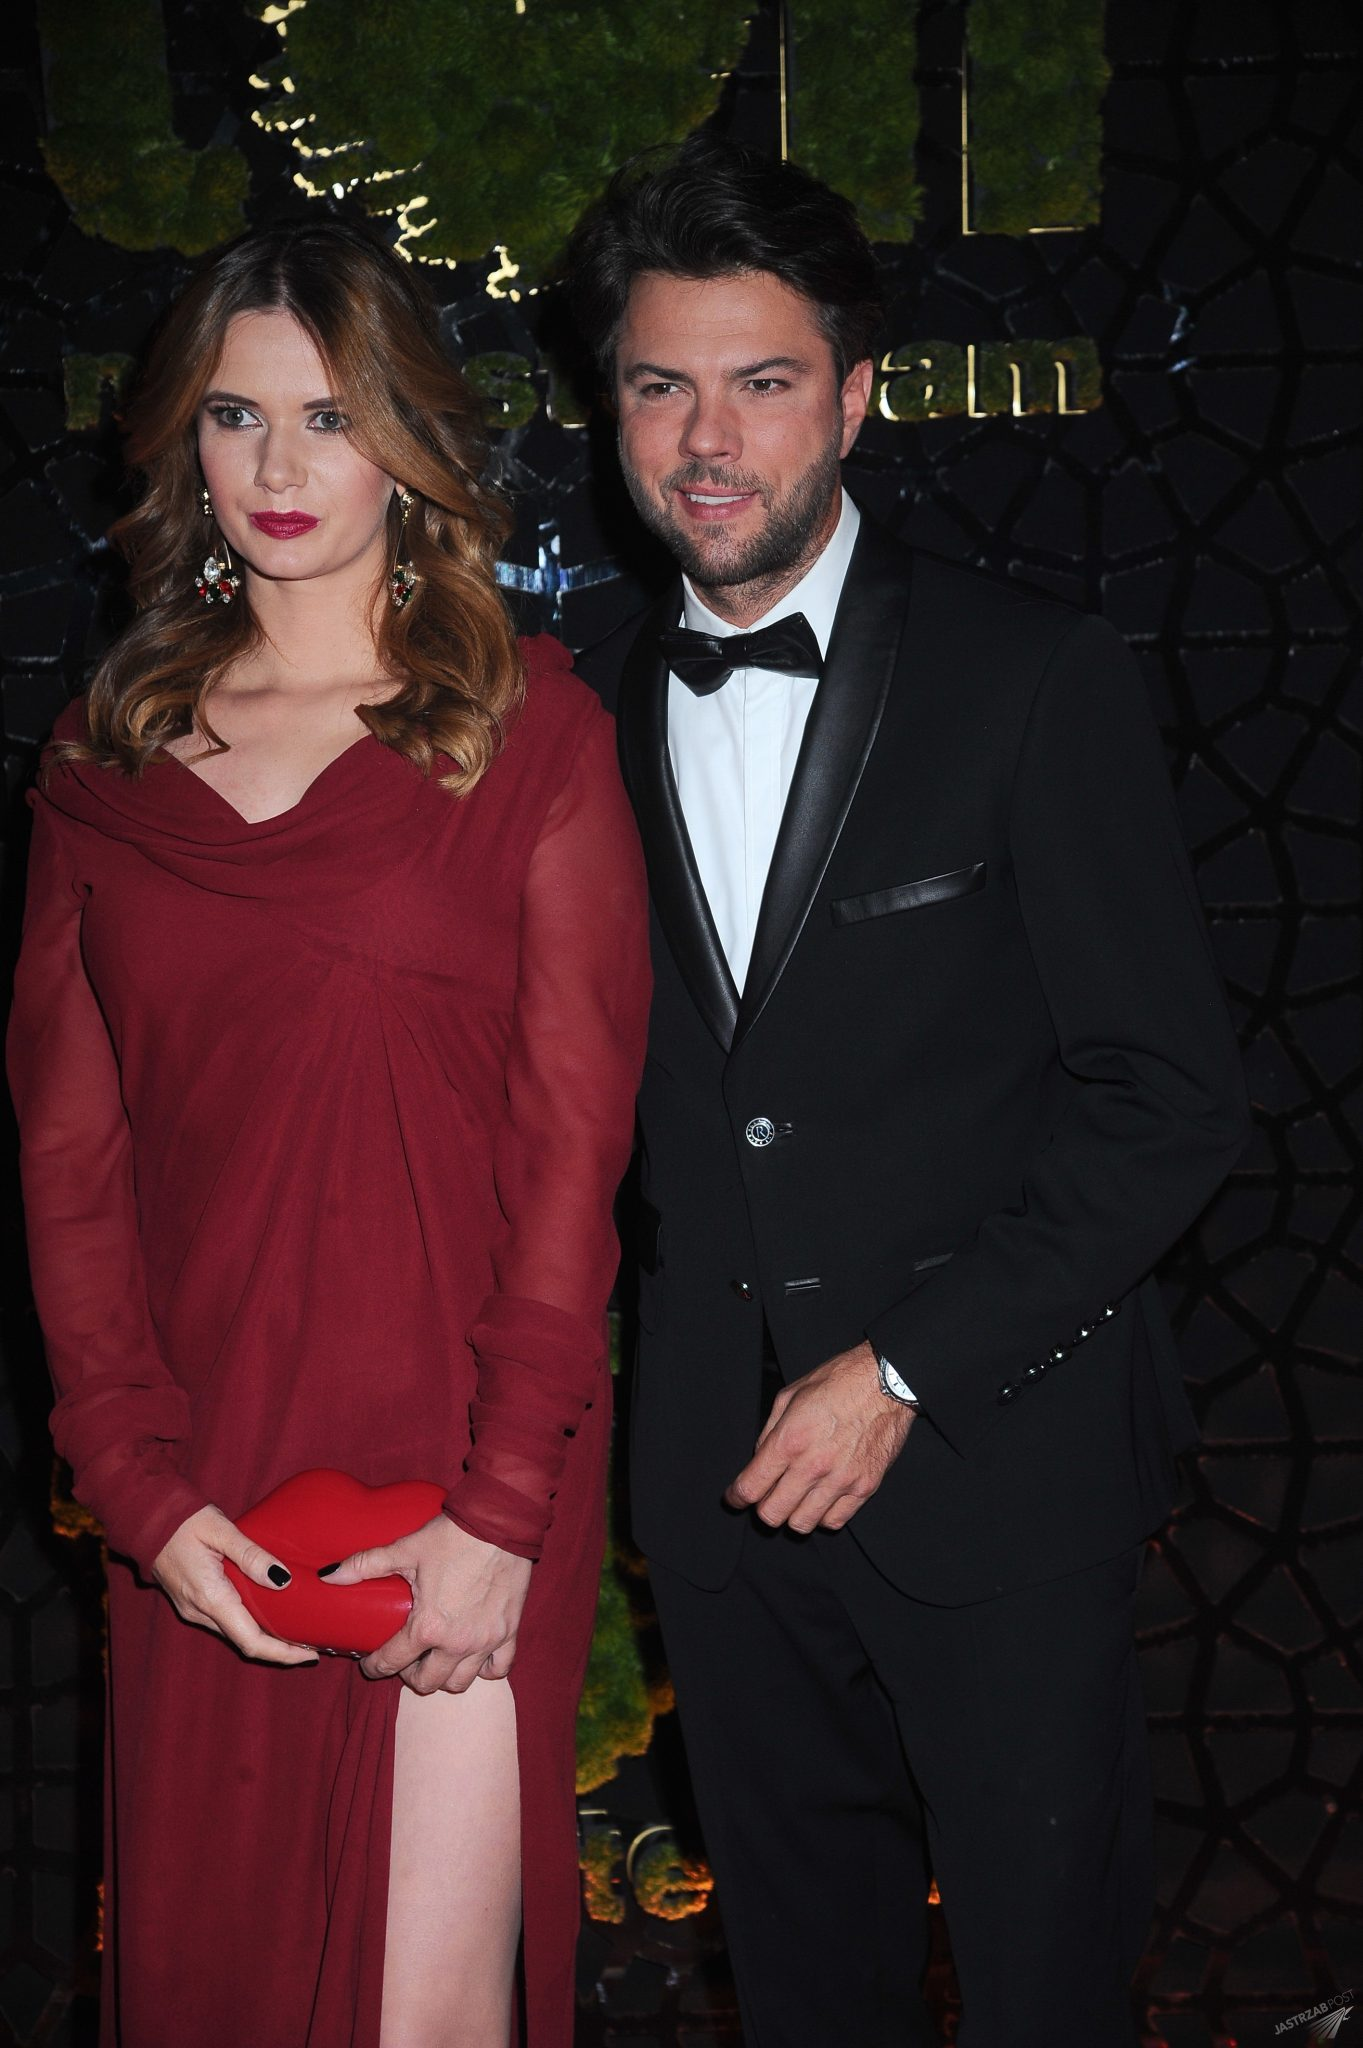 Karolina Malinowska i Olivier Janiak na balu TVN 2015